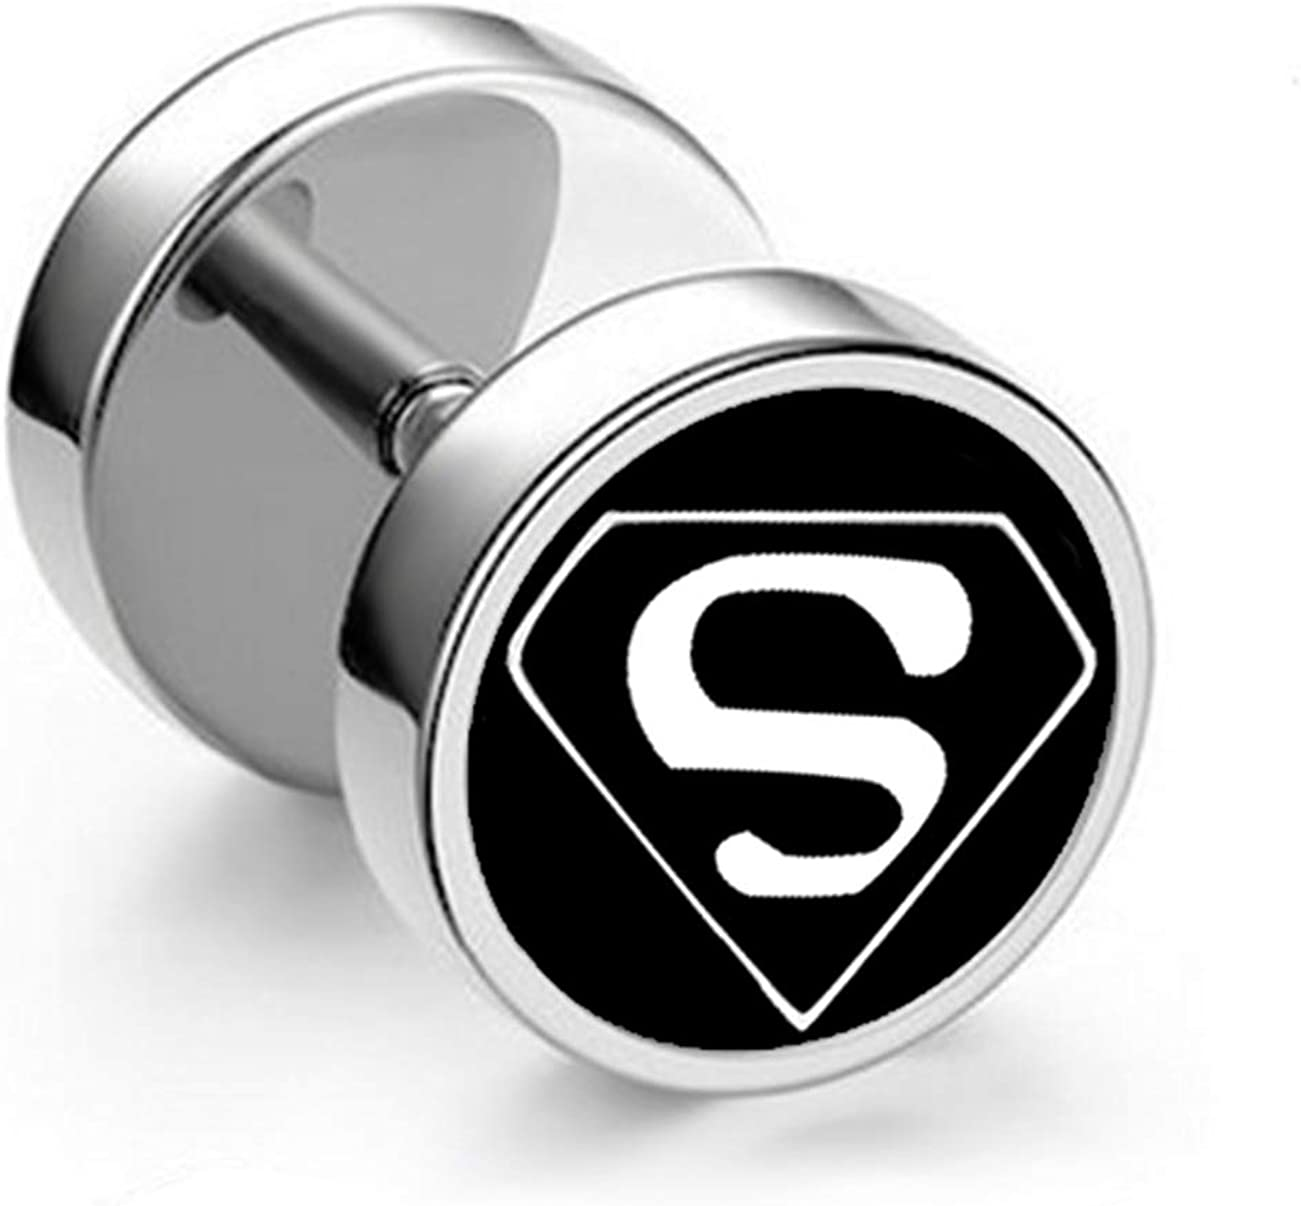 SL SweetLove Punk Style Round Screw Stud Earrings Set Titanium Stainless Steel Cool Pierced Earring for Men Women Girls Boys